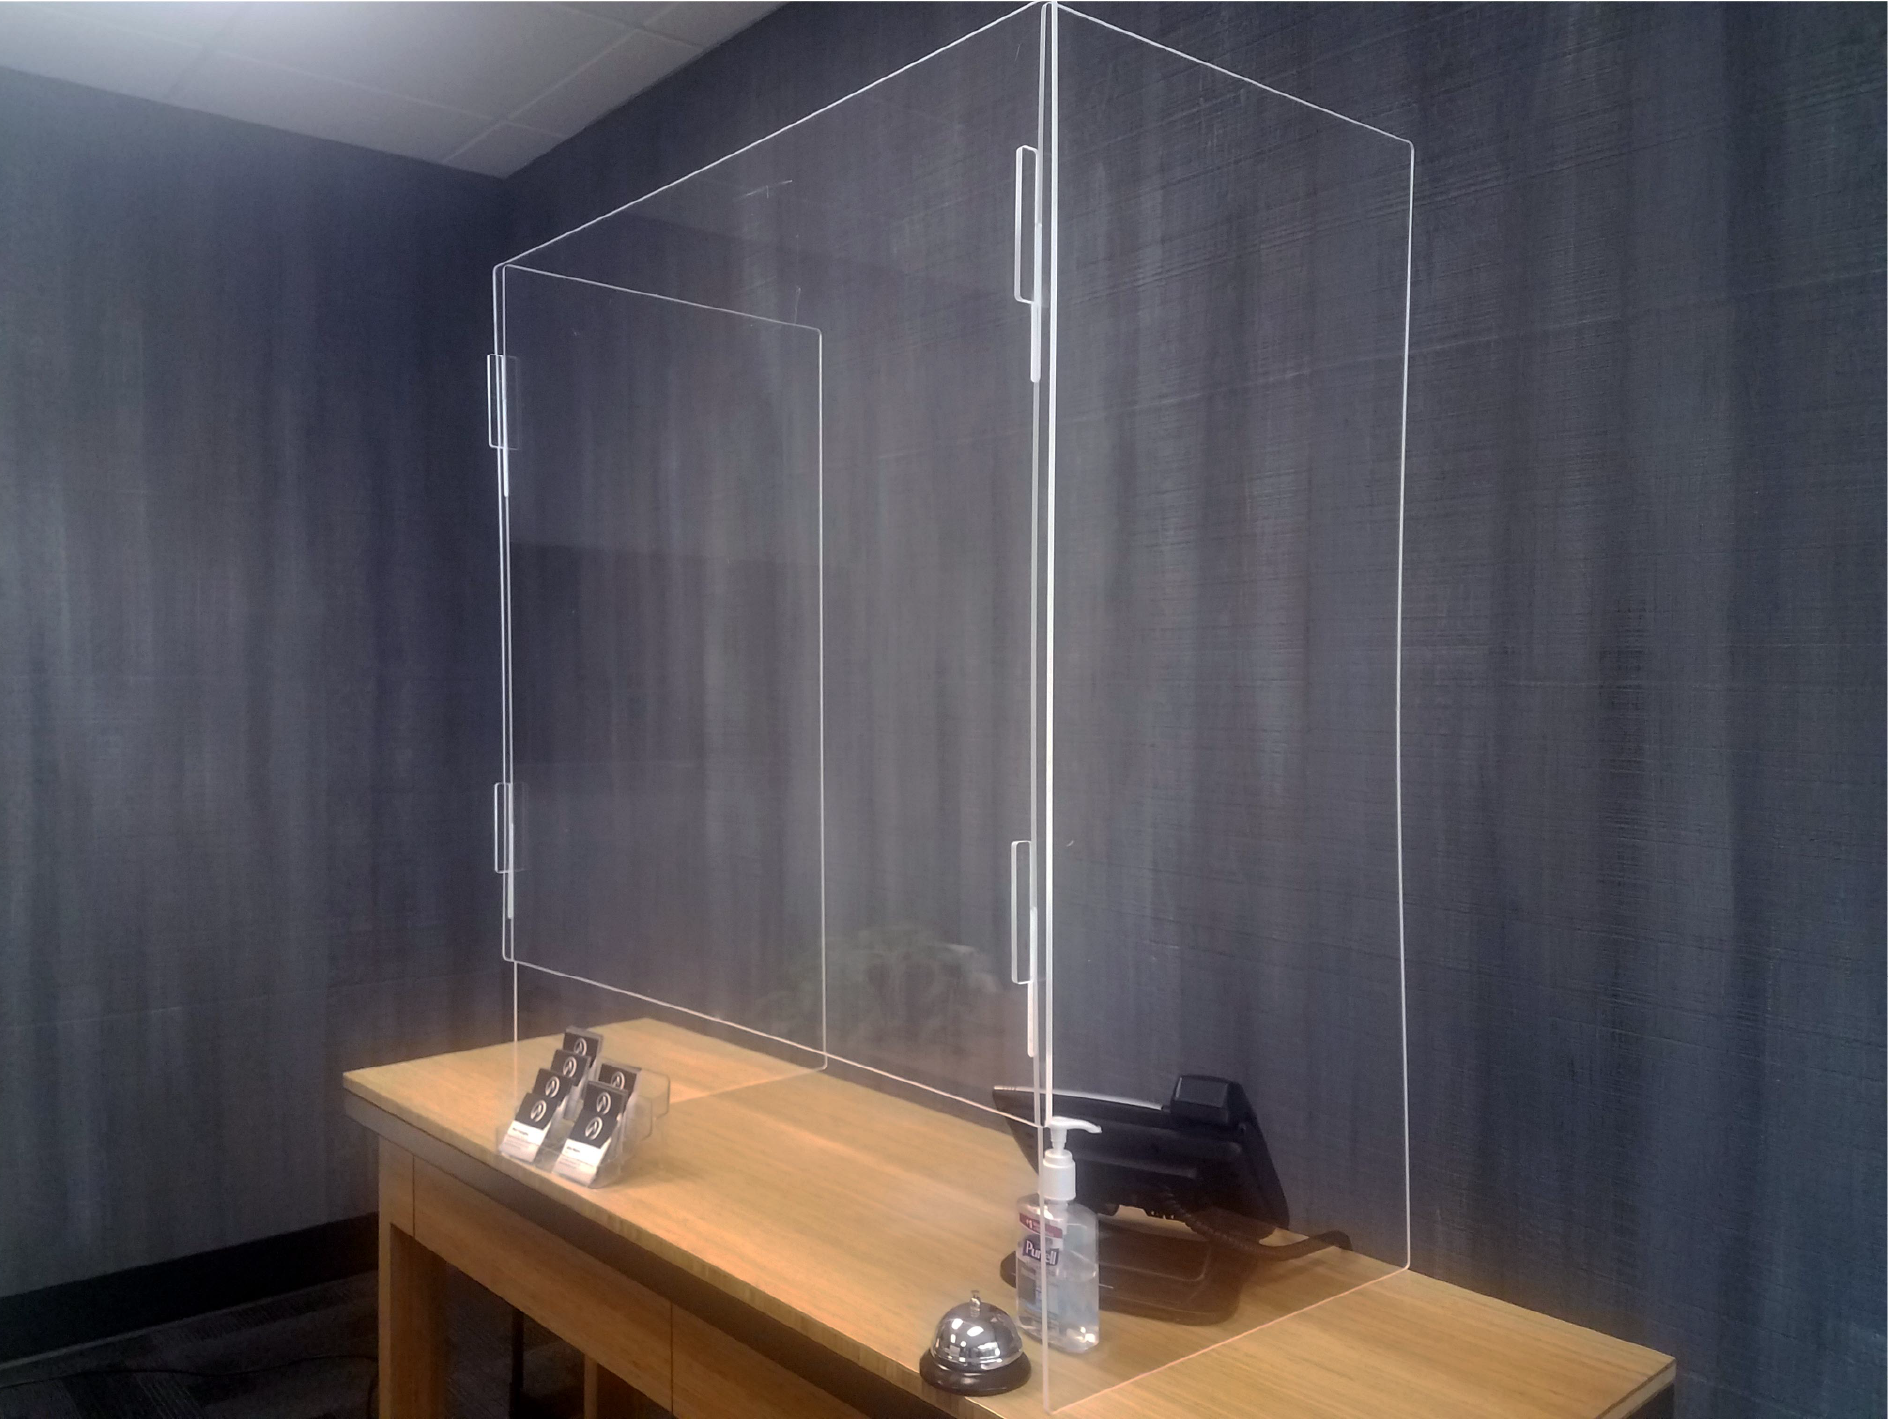 Plexiglass barriers